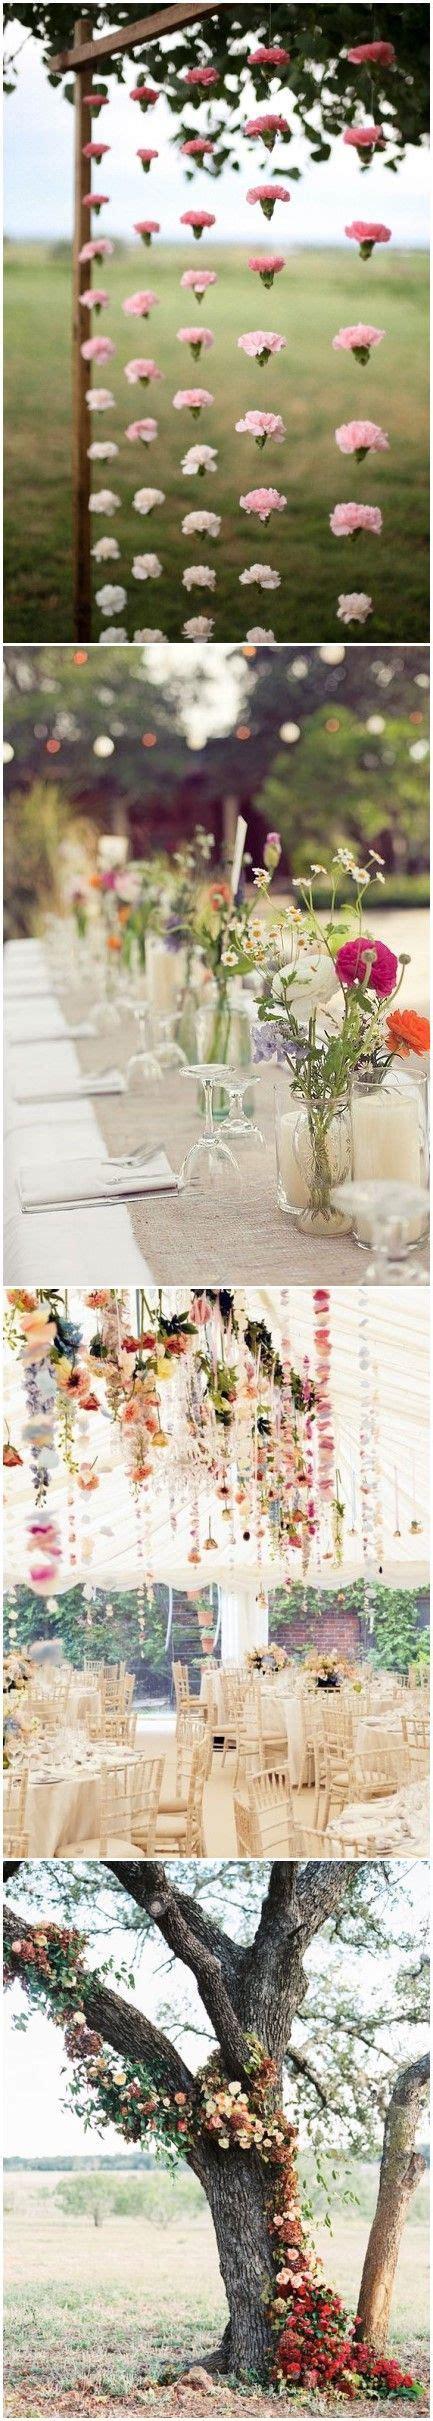 20 gorgeous boho wedding d 233 cor ideas on pinterest boho